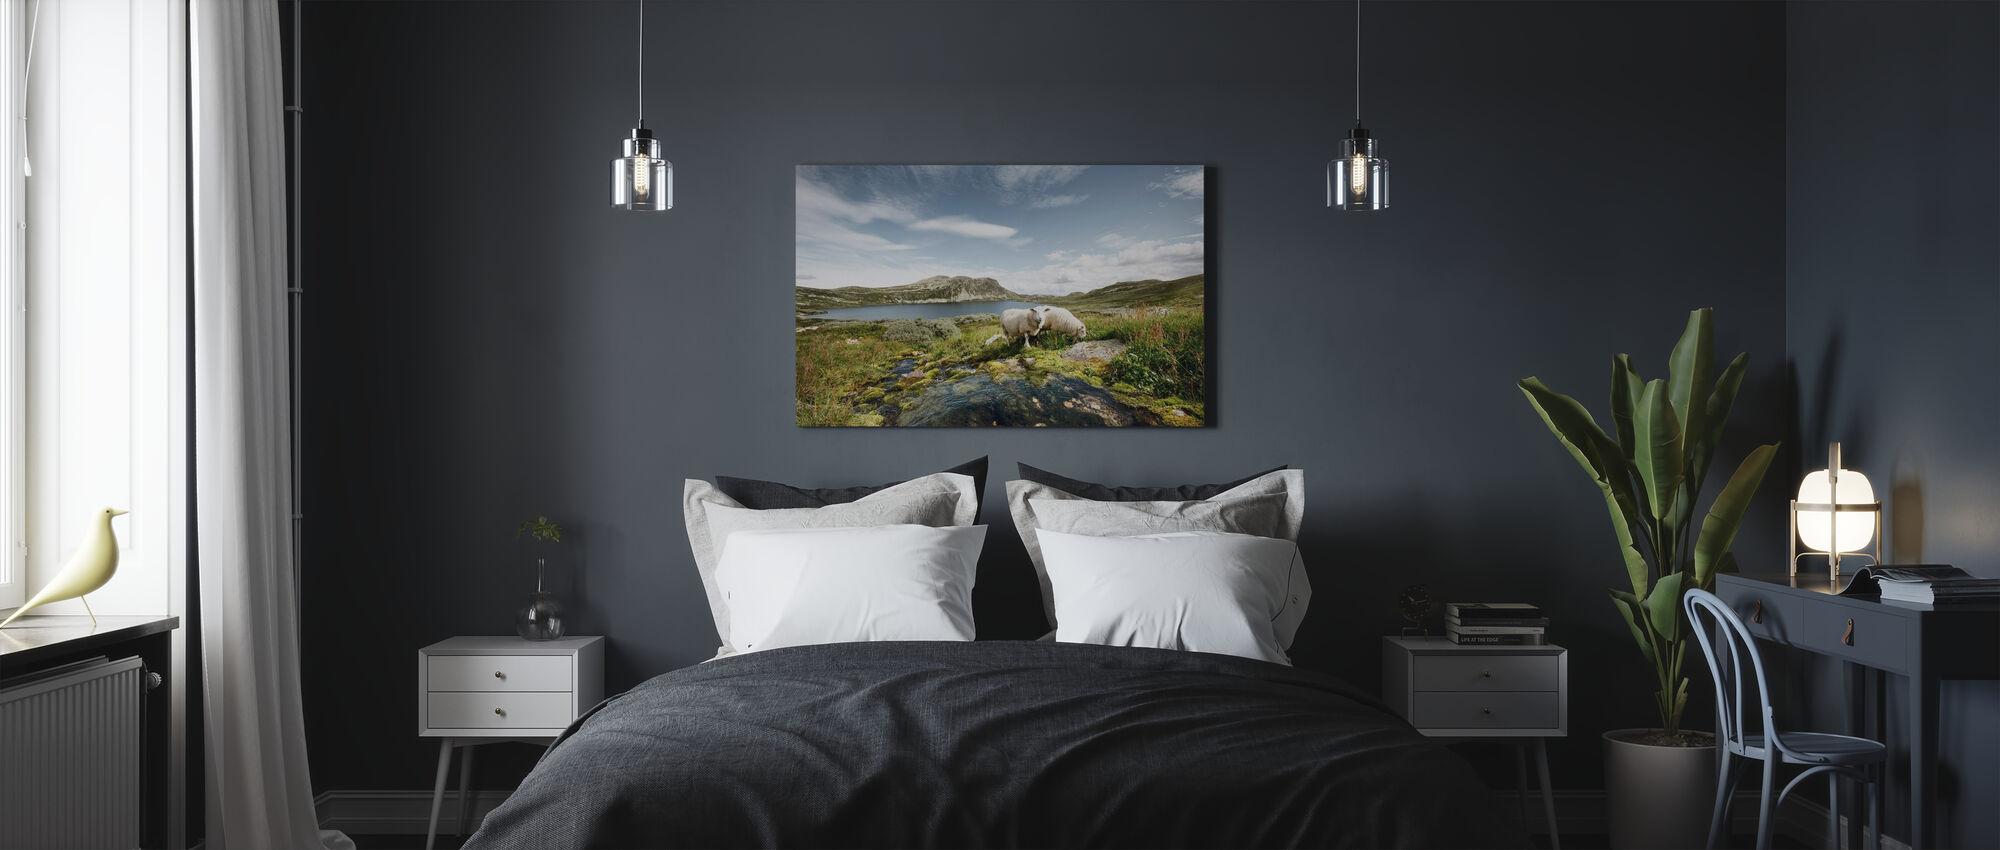 Får ved innsjø i Norge - Lerretsbilde - Soverom